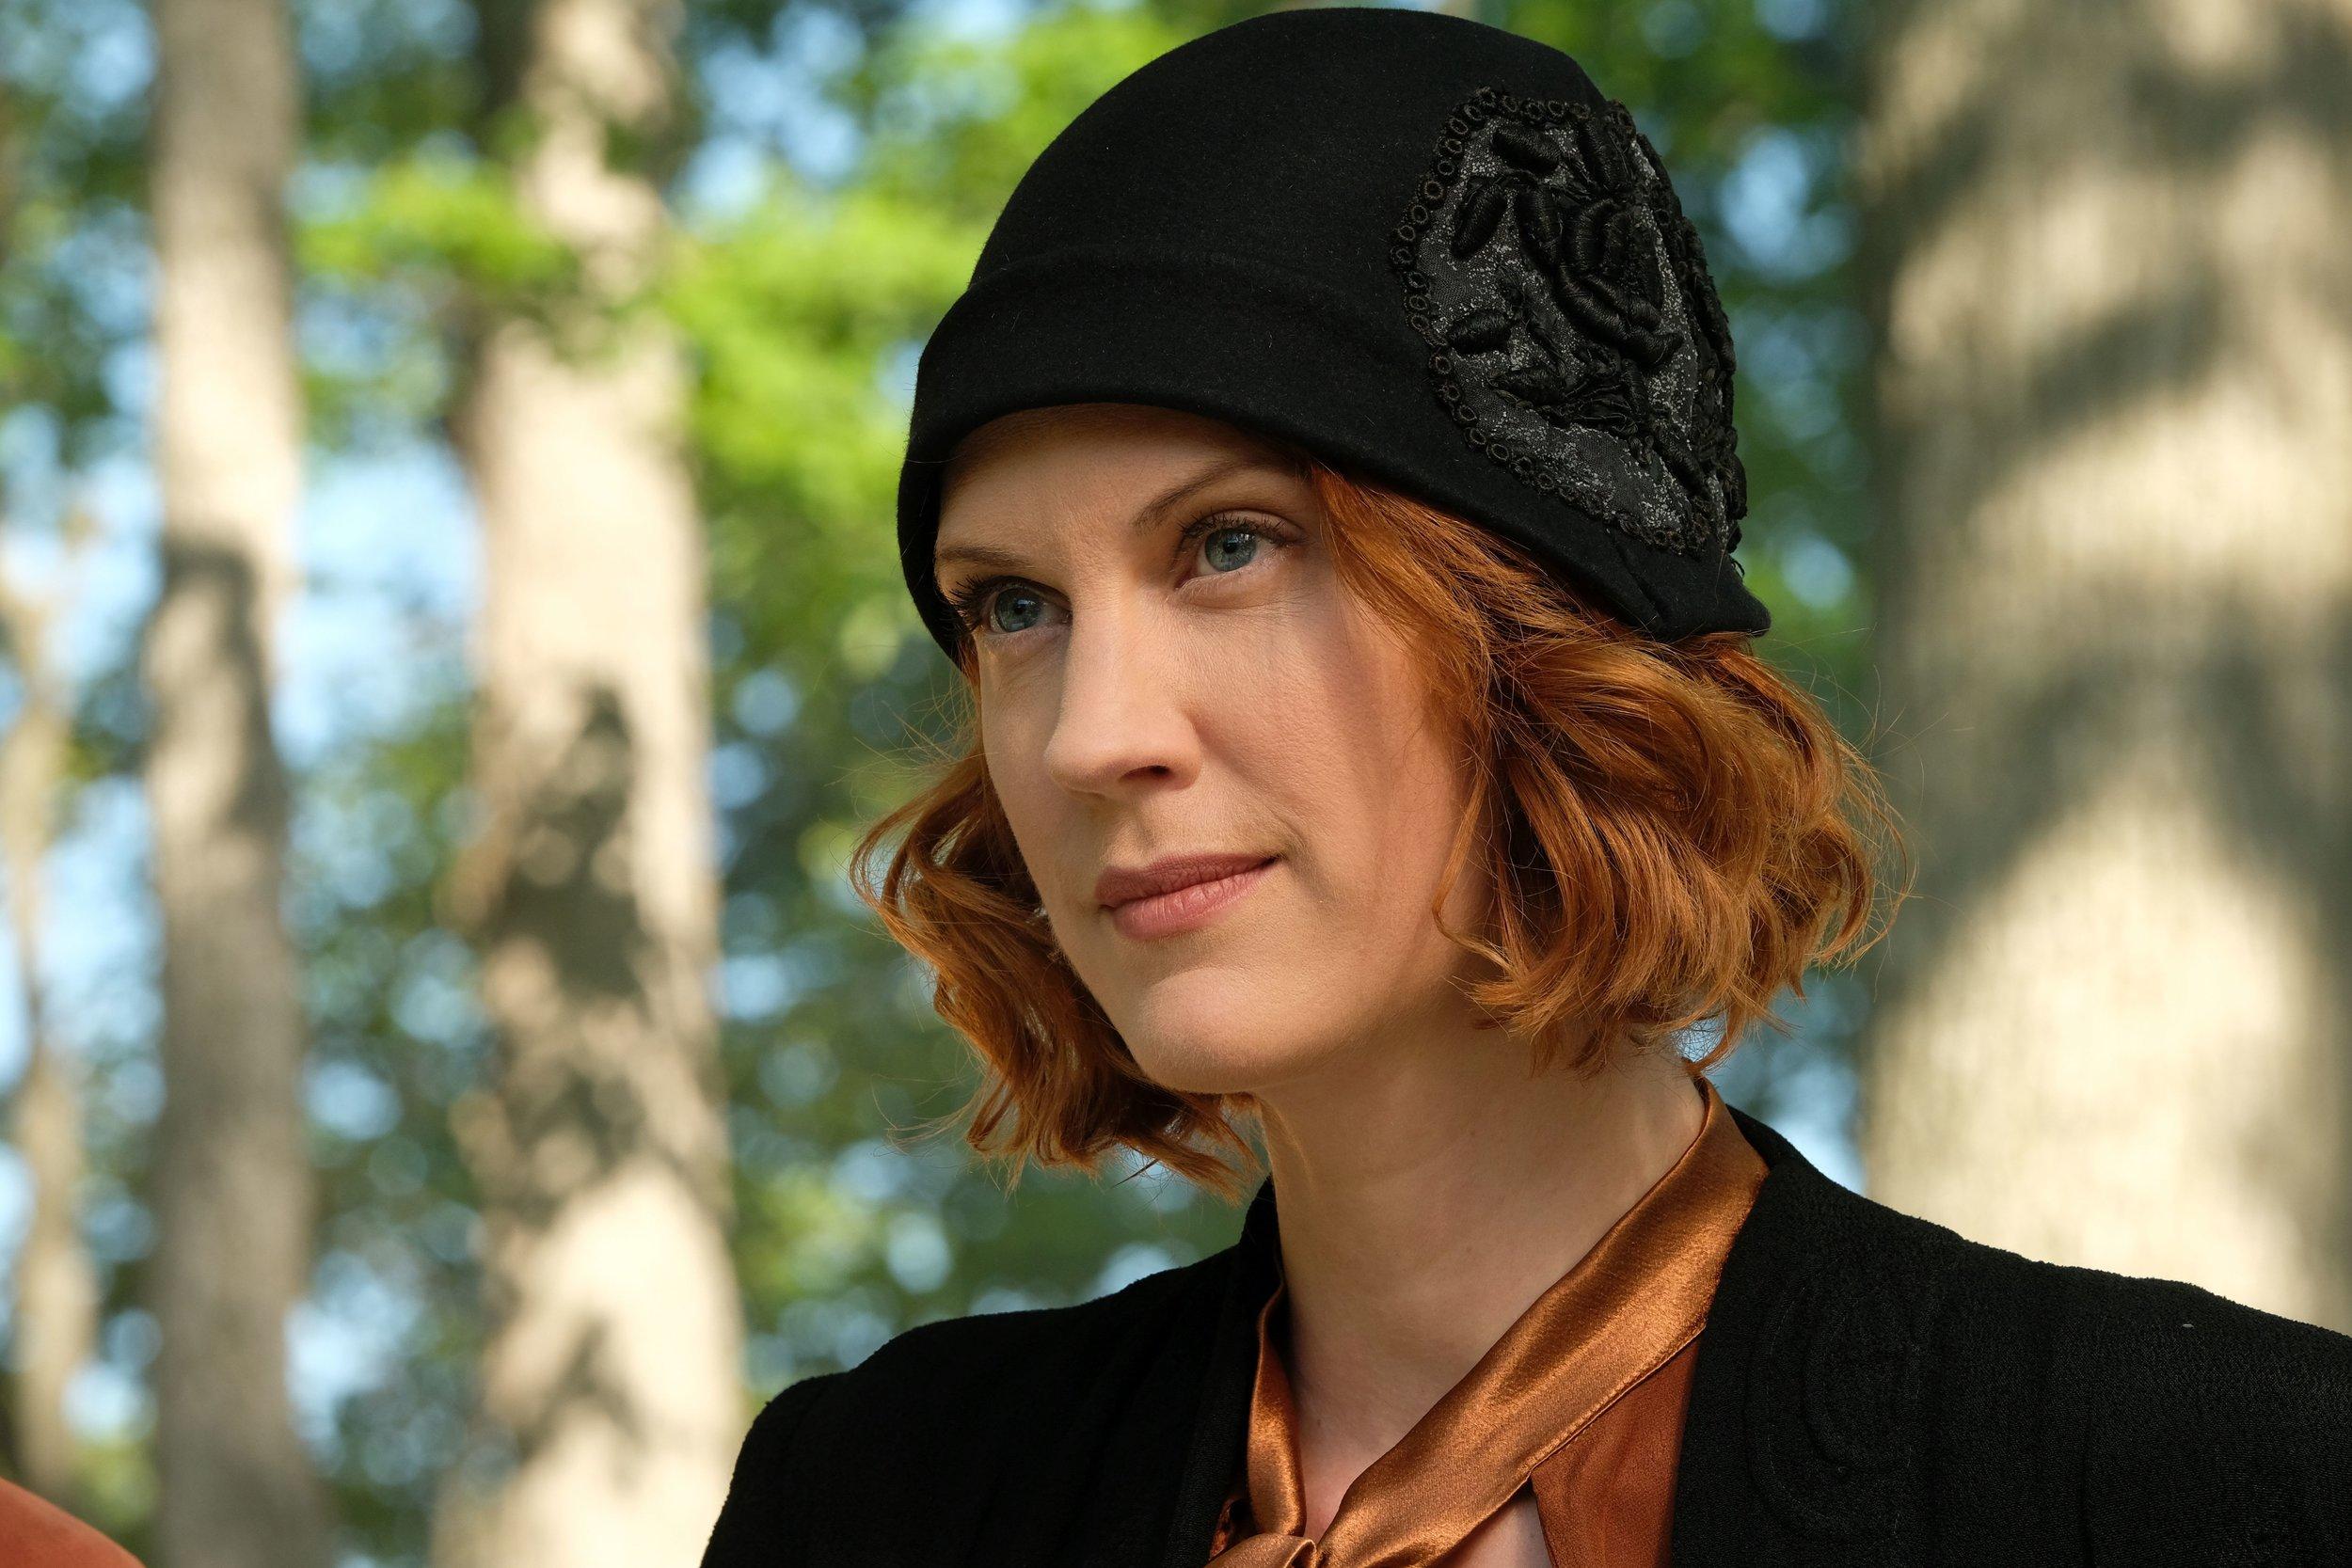 Lauren Lee Smith in CBC's Frankie Drake Mysteries